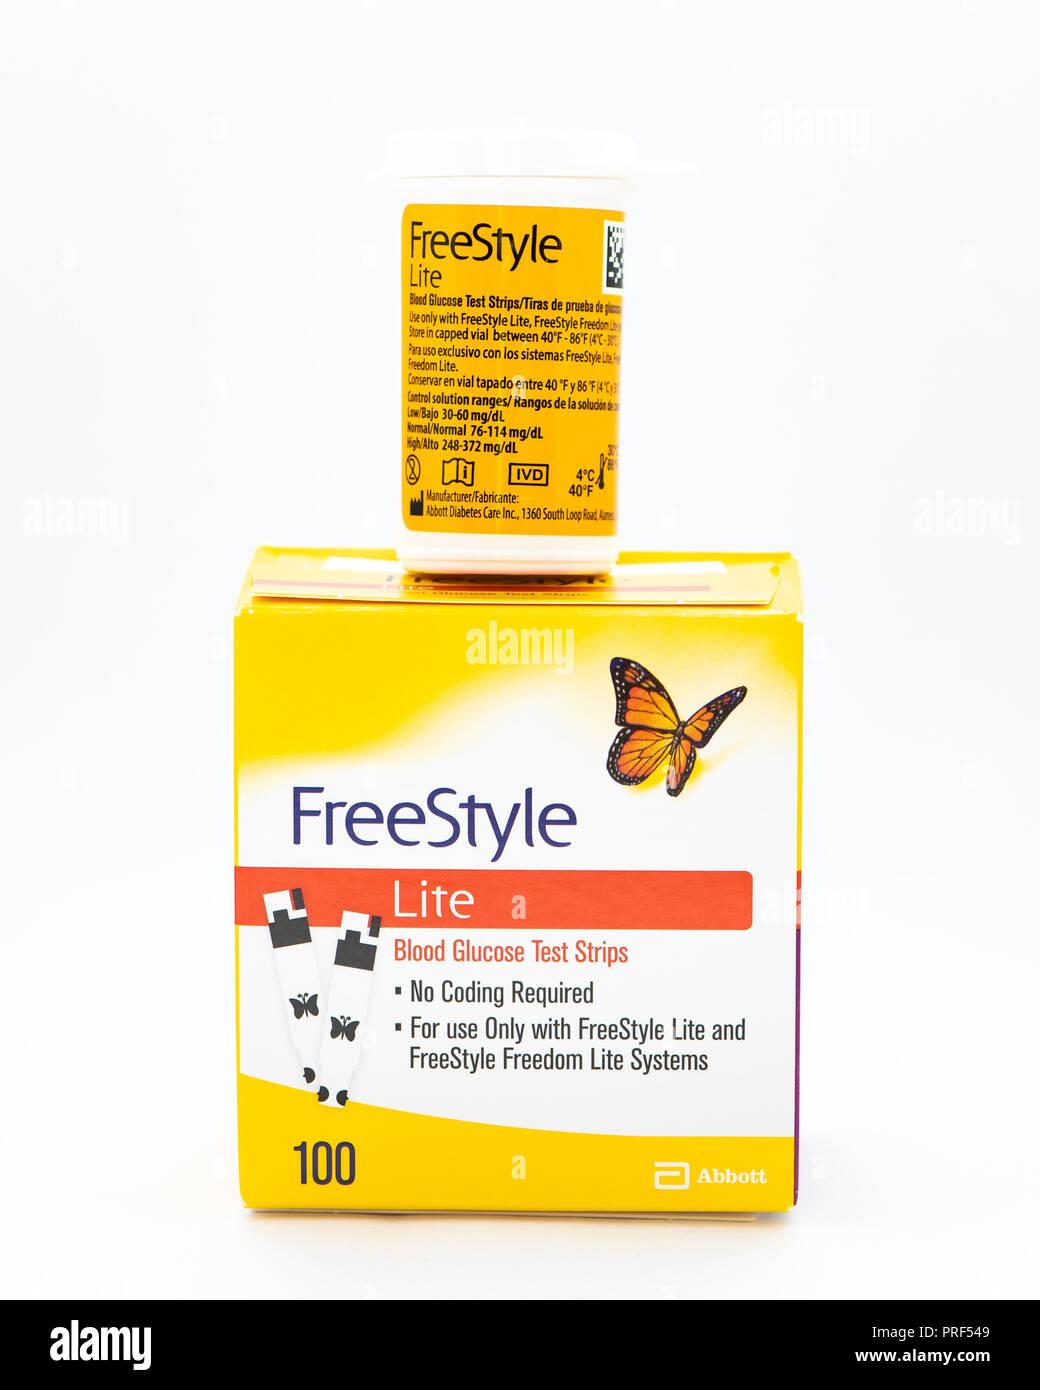 Freestyle Lite Test Strips Walgreens : freestyle, strips, walgreens, FreeStyle, Blood, Glucose, Strips, Stock, Photo, Alamy